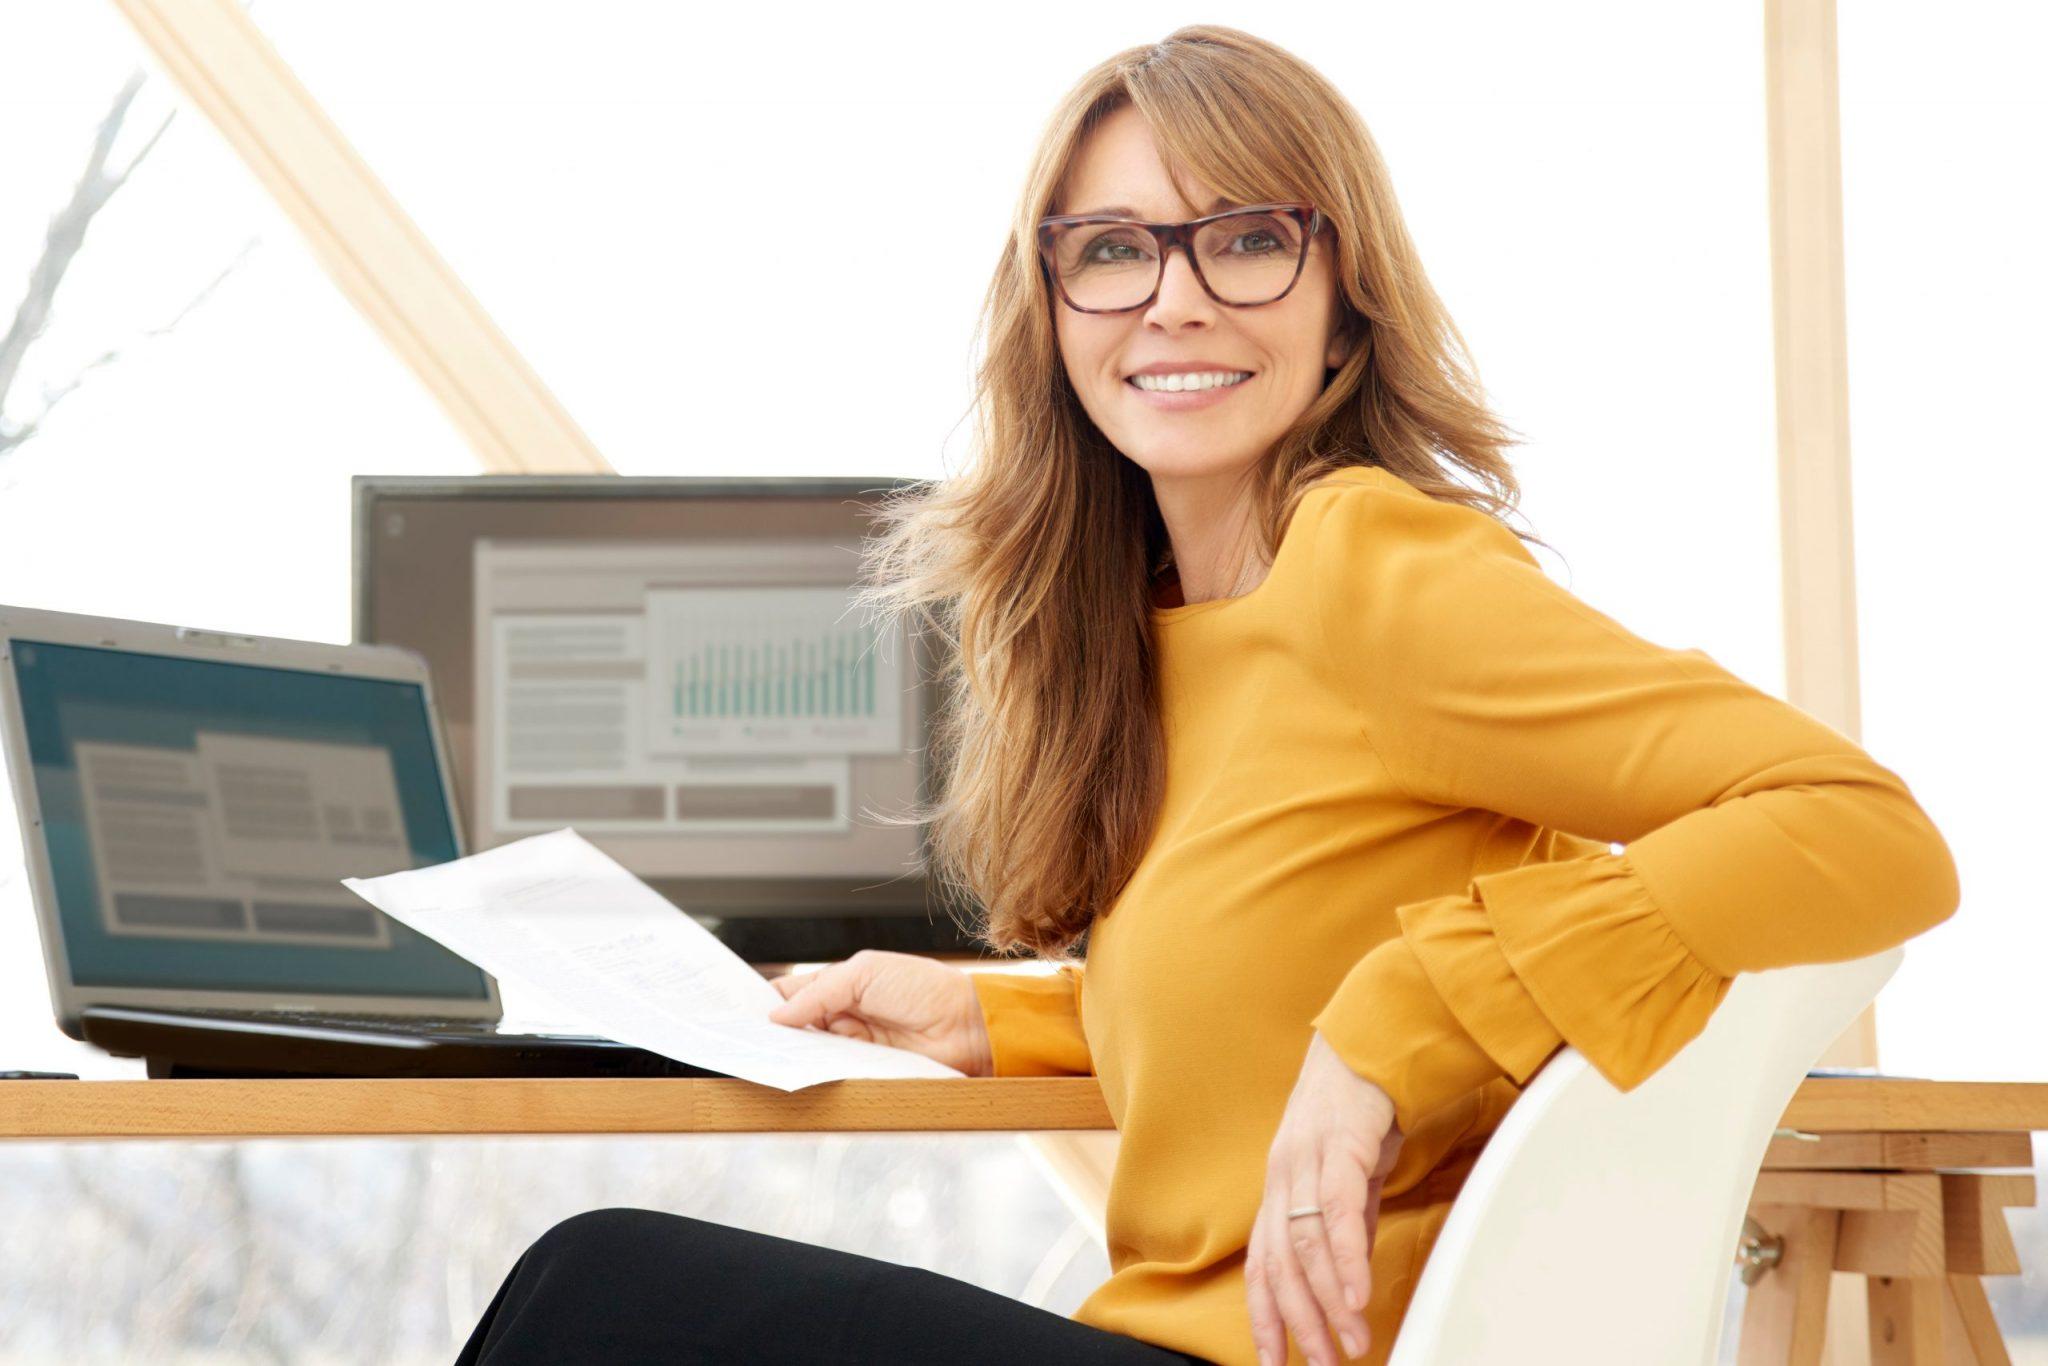 Employee at desk